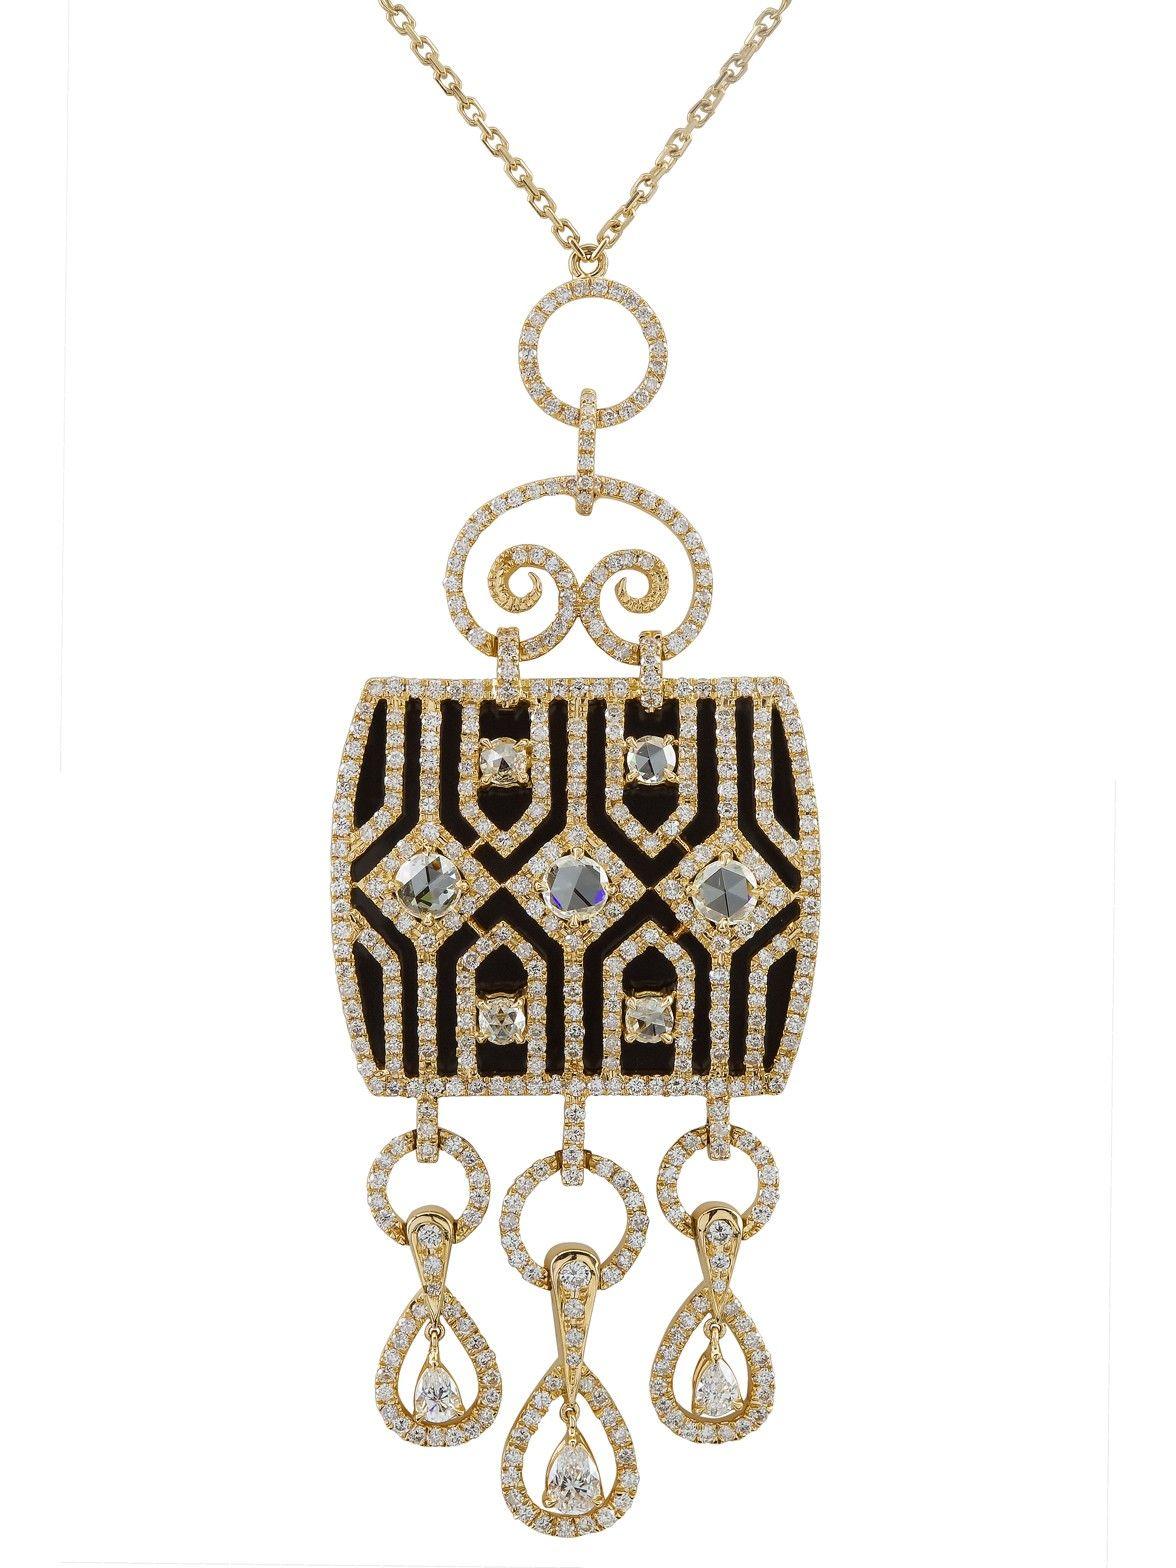 Al zain k yellow gold diamond and black enamel pendant necklace